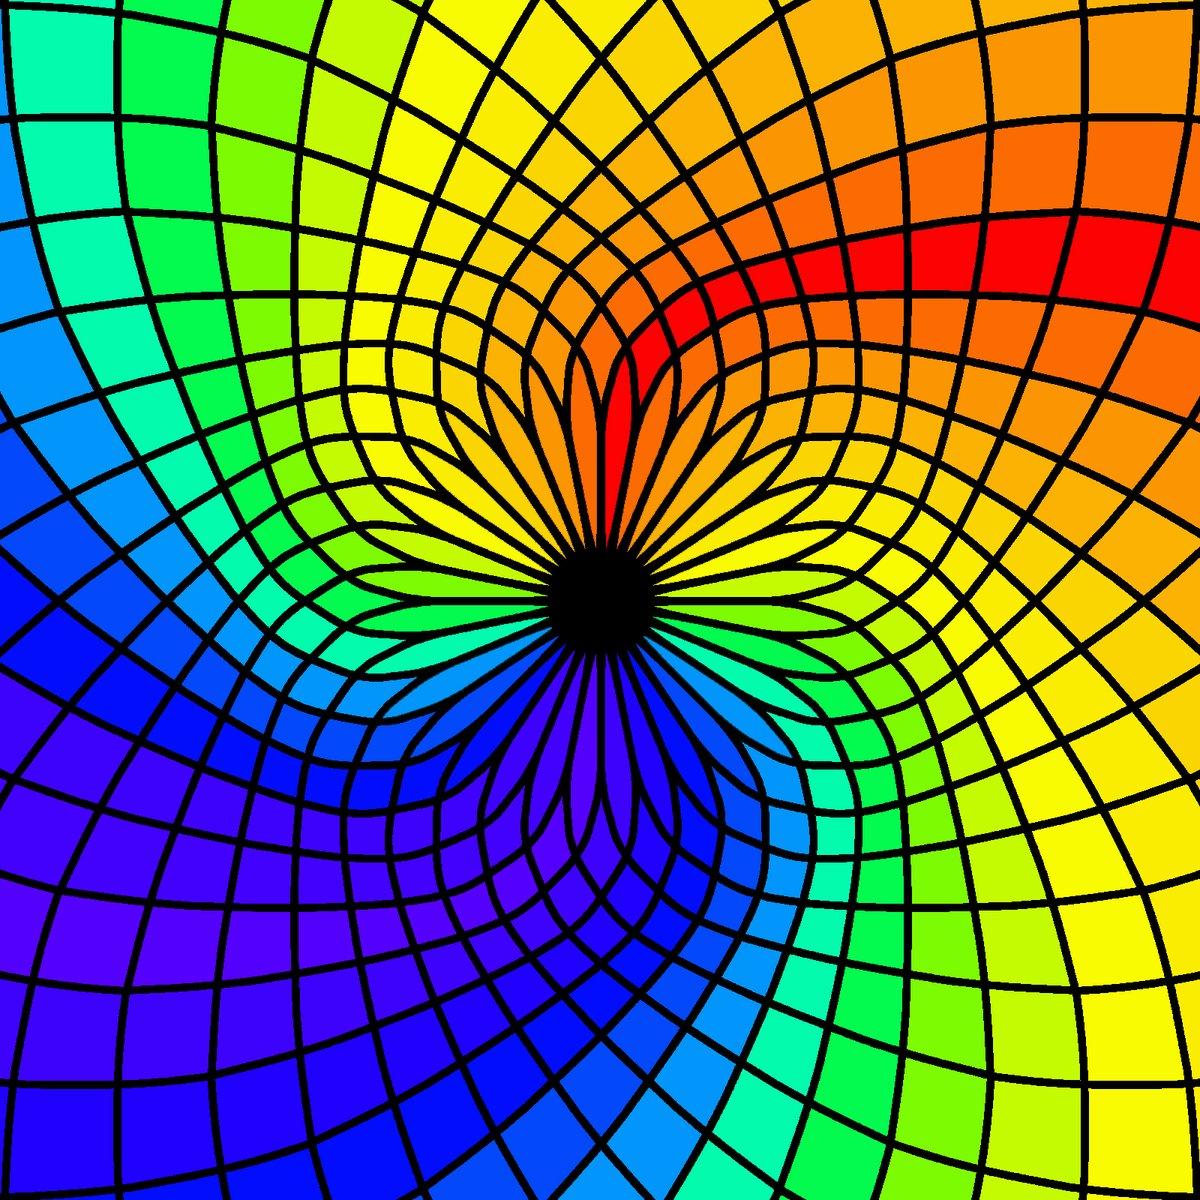 #digitalart #digital #art #photoshop #photoshopart #firealpaca #firealpacaart #fractal #symmetry #flow #rainbow #colours #shades #tones #red #orange #yellow #green #blue #purple #black #trippy #psychedelic #psychedelicart #staywell #bluespic.twitter.com/scwMrngvAX